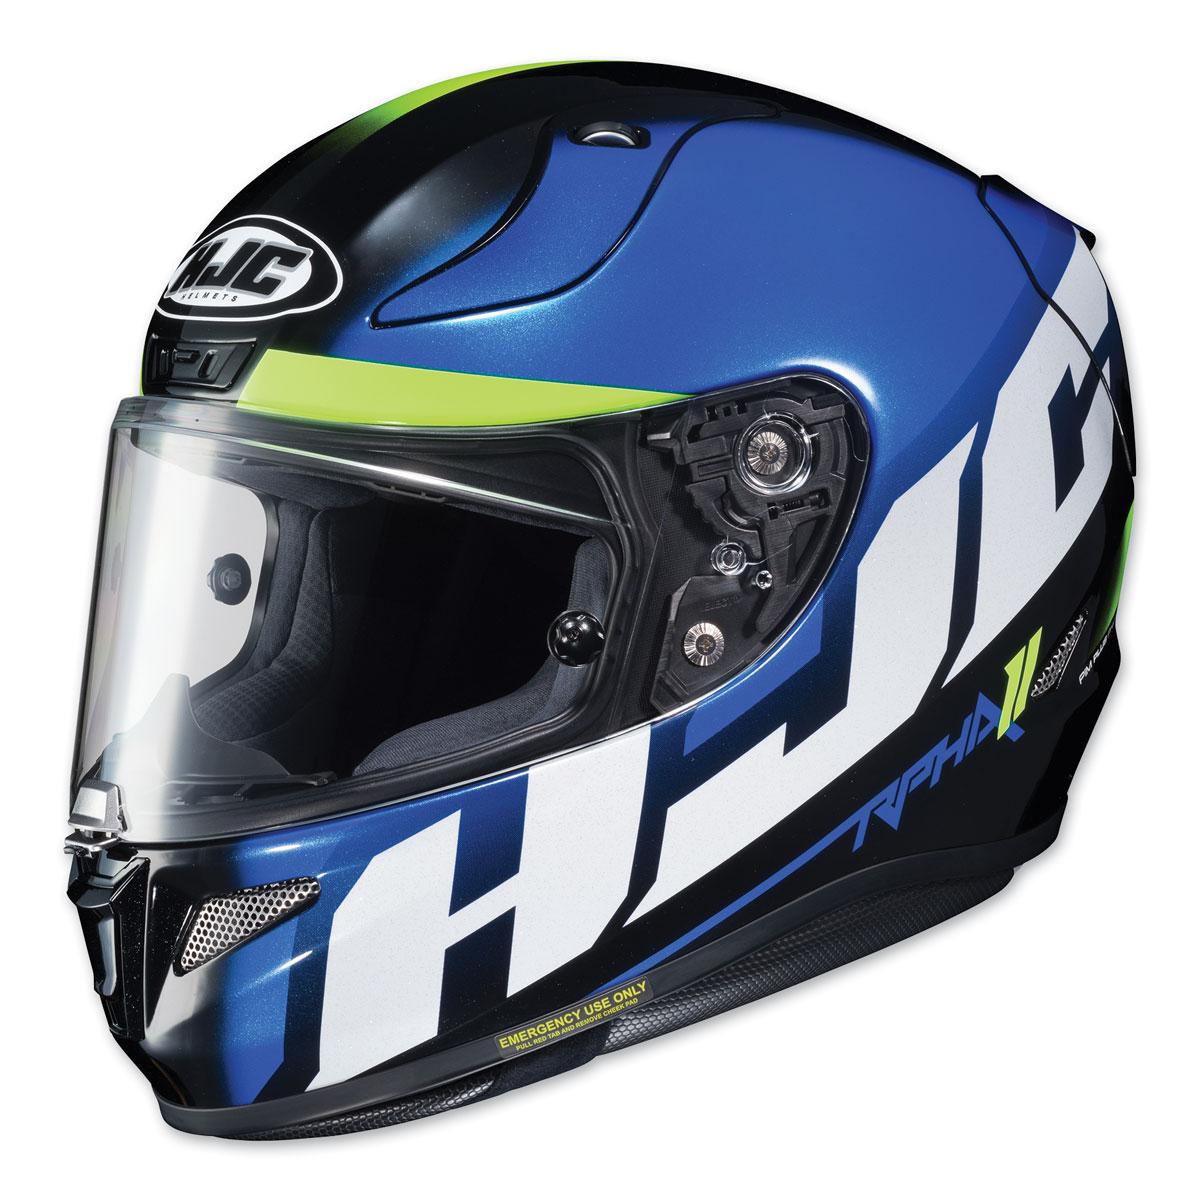 hjc rpha 11 pro spicho blue white full face helmet 160 1726 j p cycles